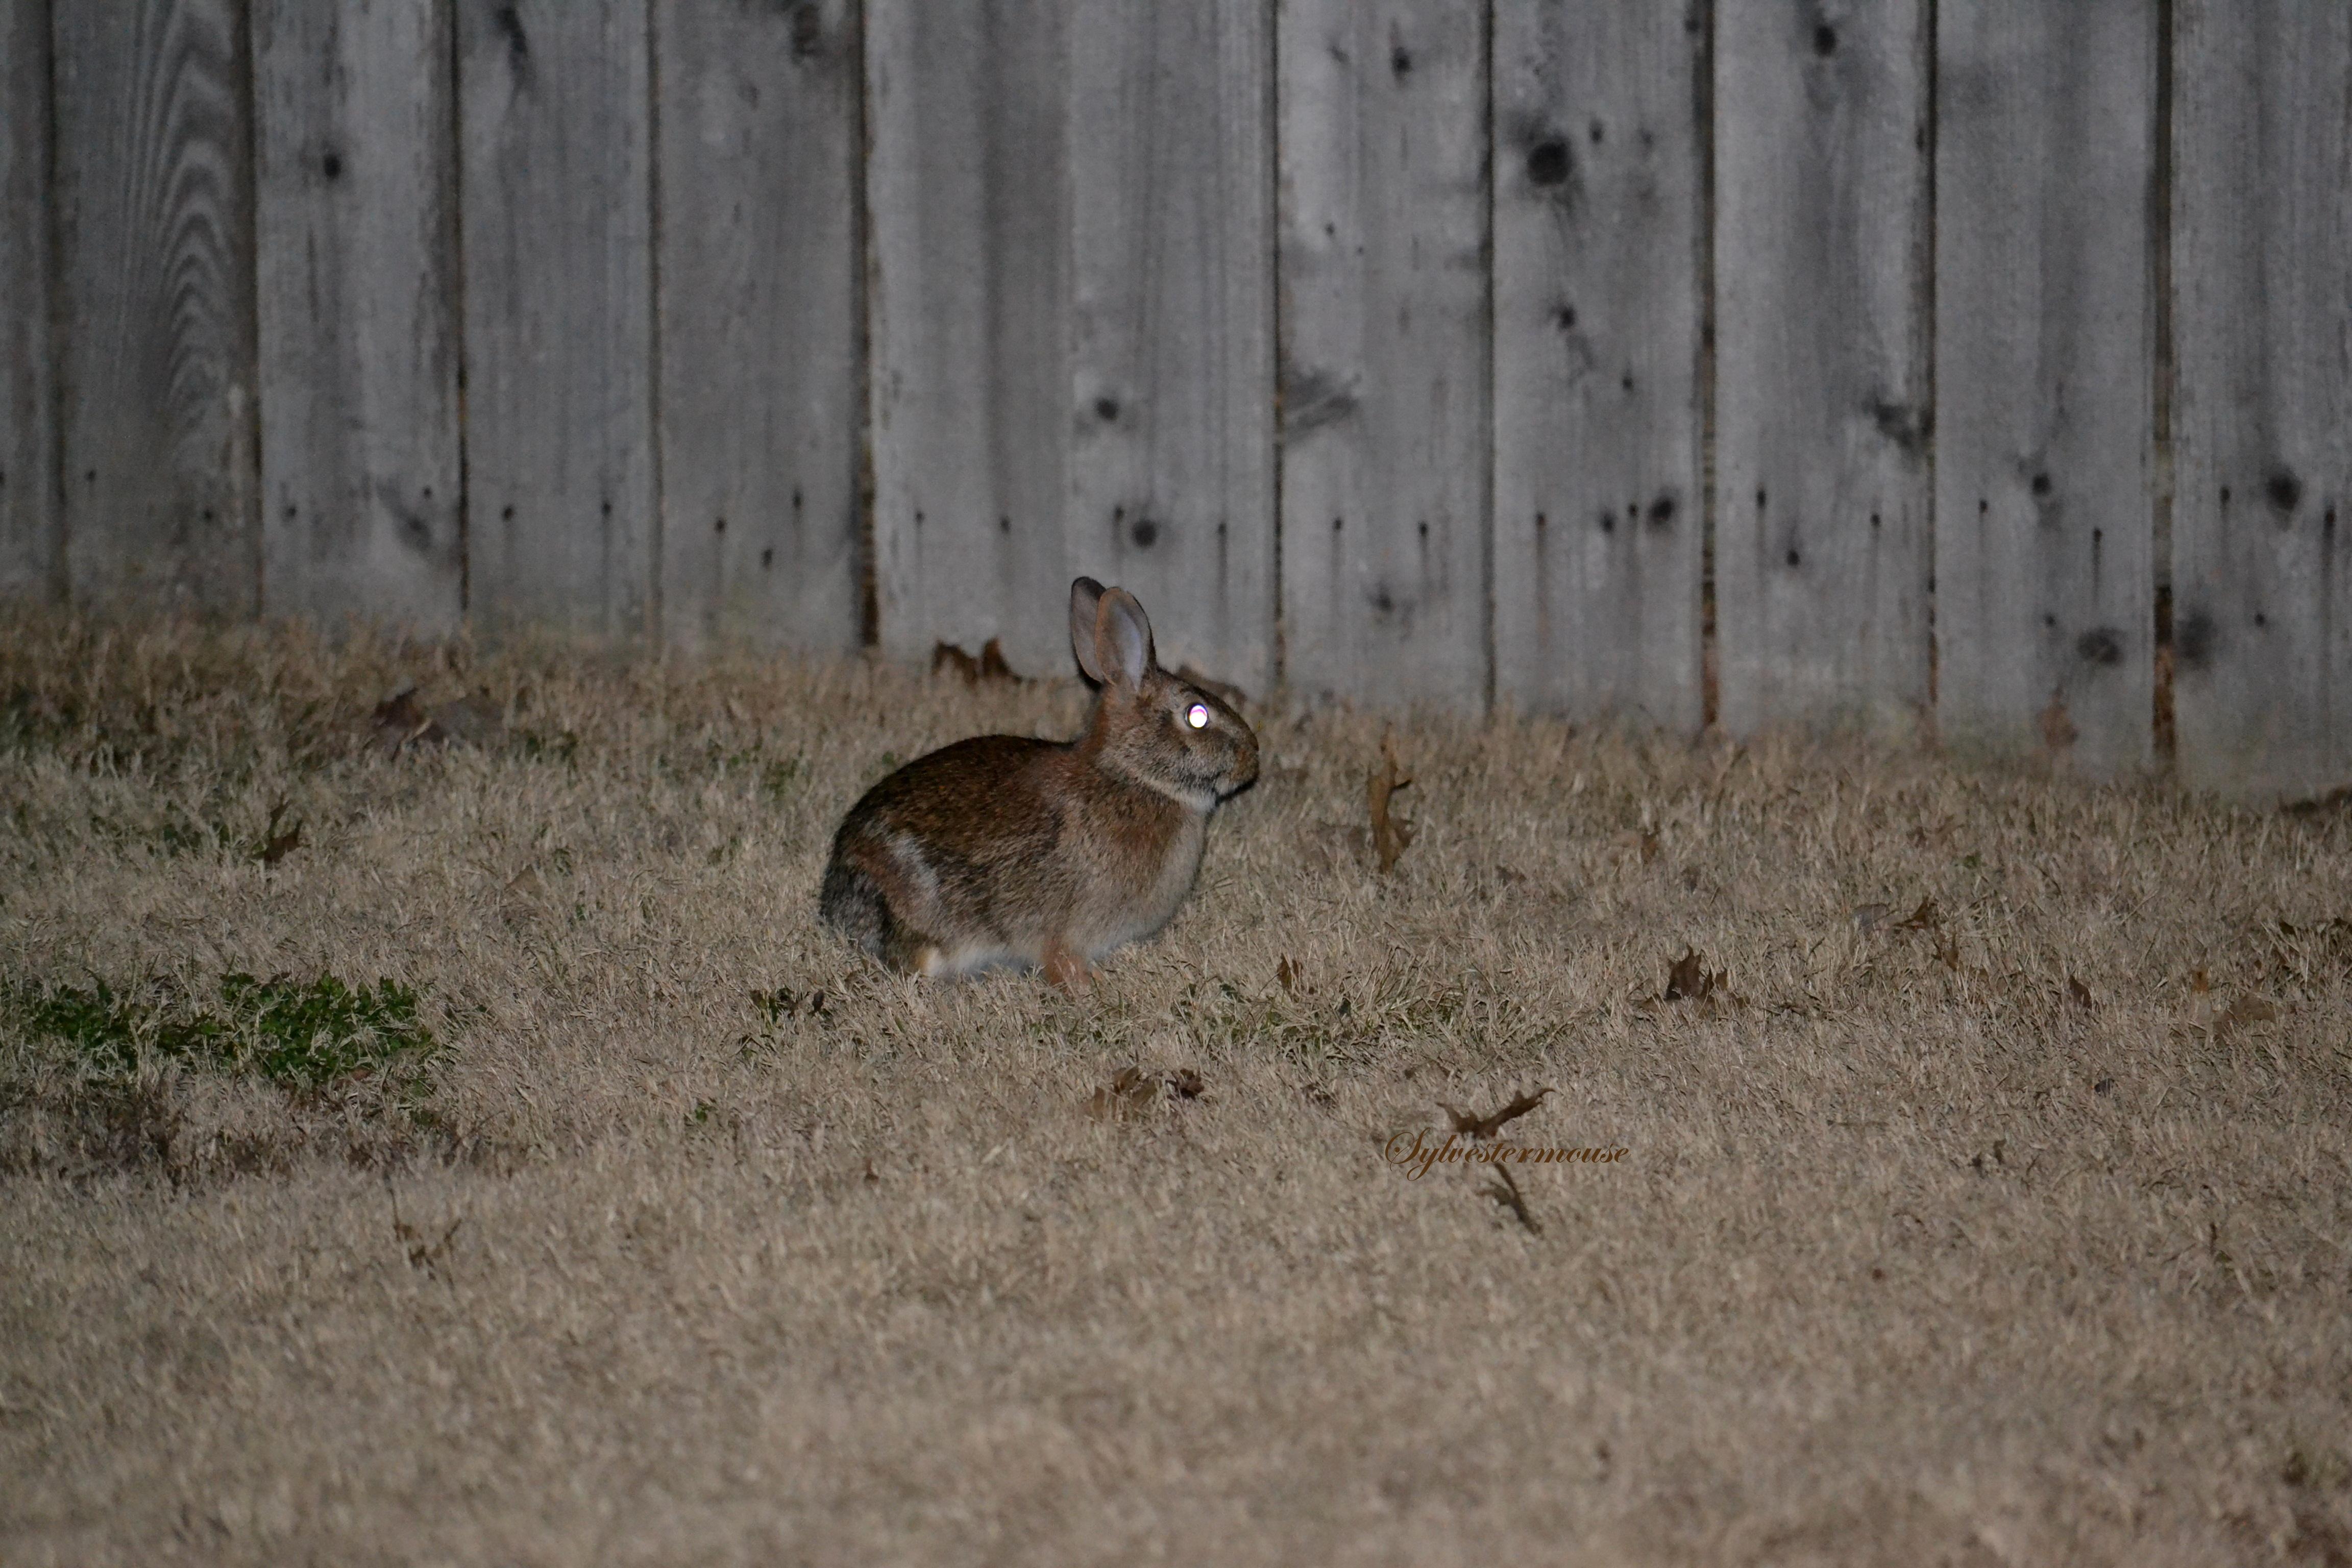 Beautiful Backyard Bunny Photo - Photography by Sylvestermouse